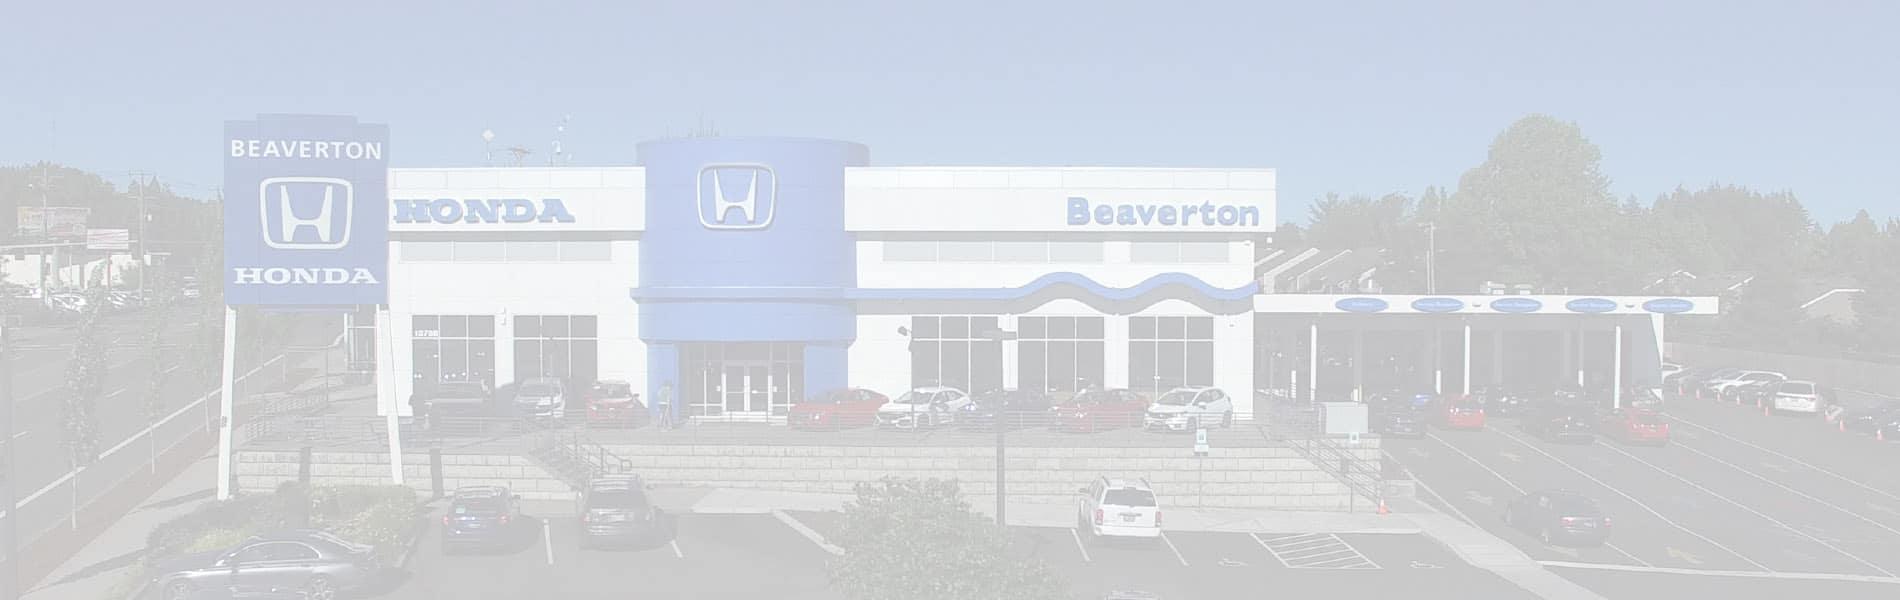 Beaverton Honda Family Run Honda Dealer In Portland Oregon